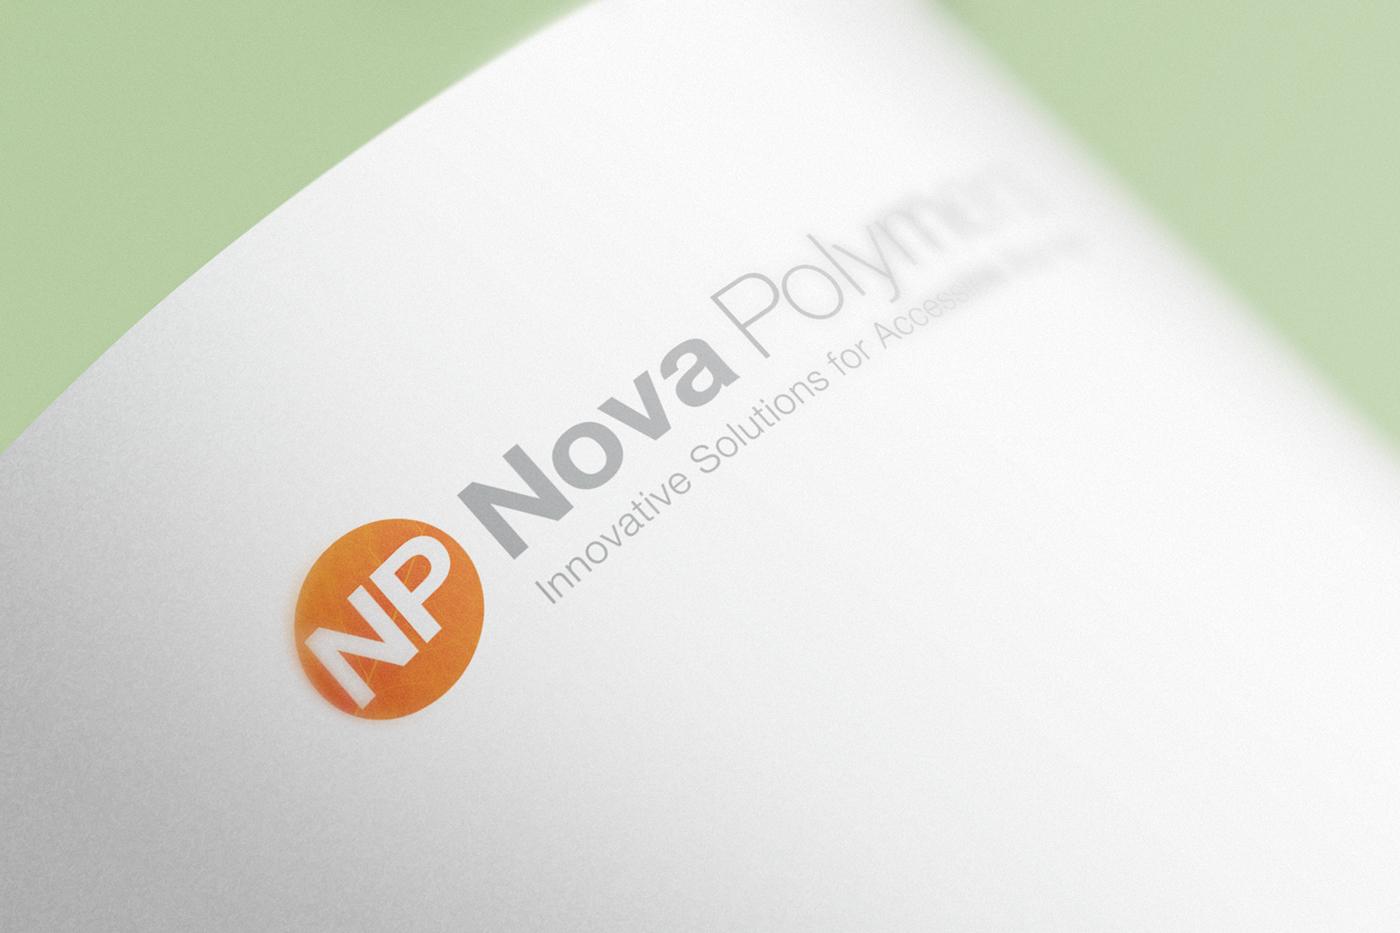 Nova Polymers Logo Design on Paper